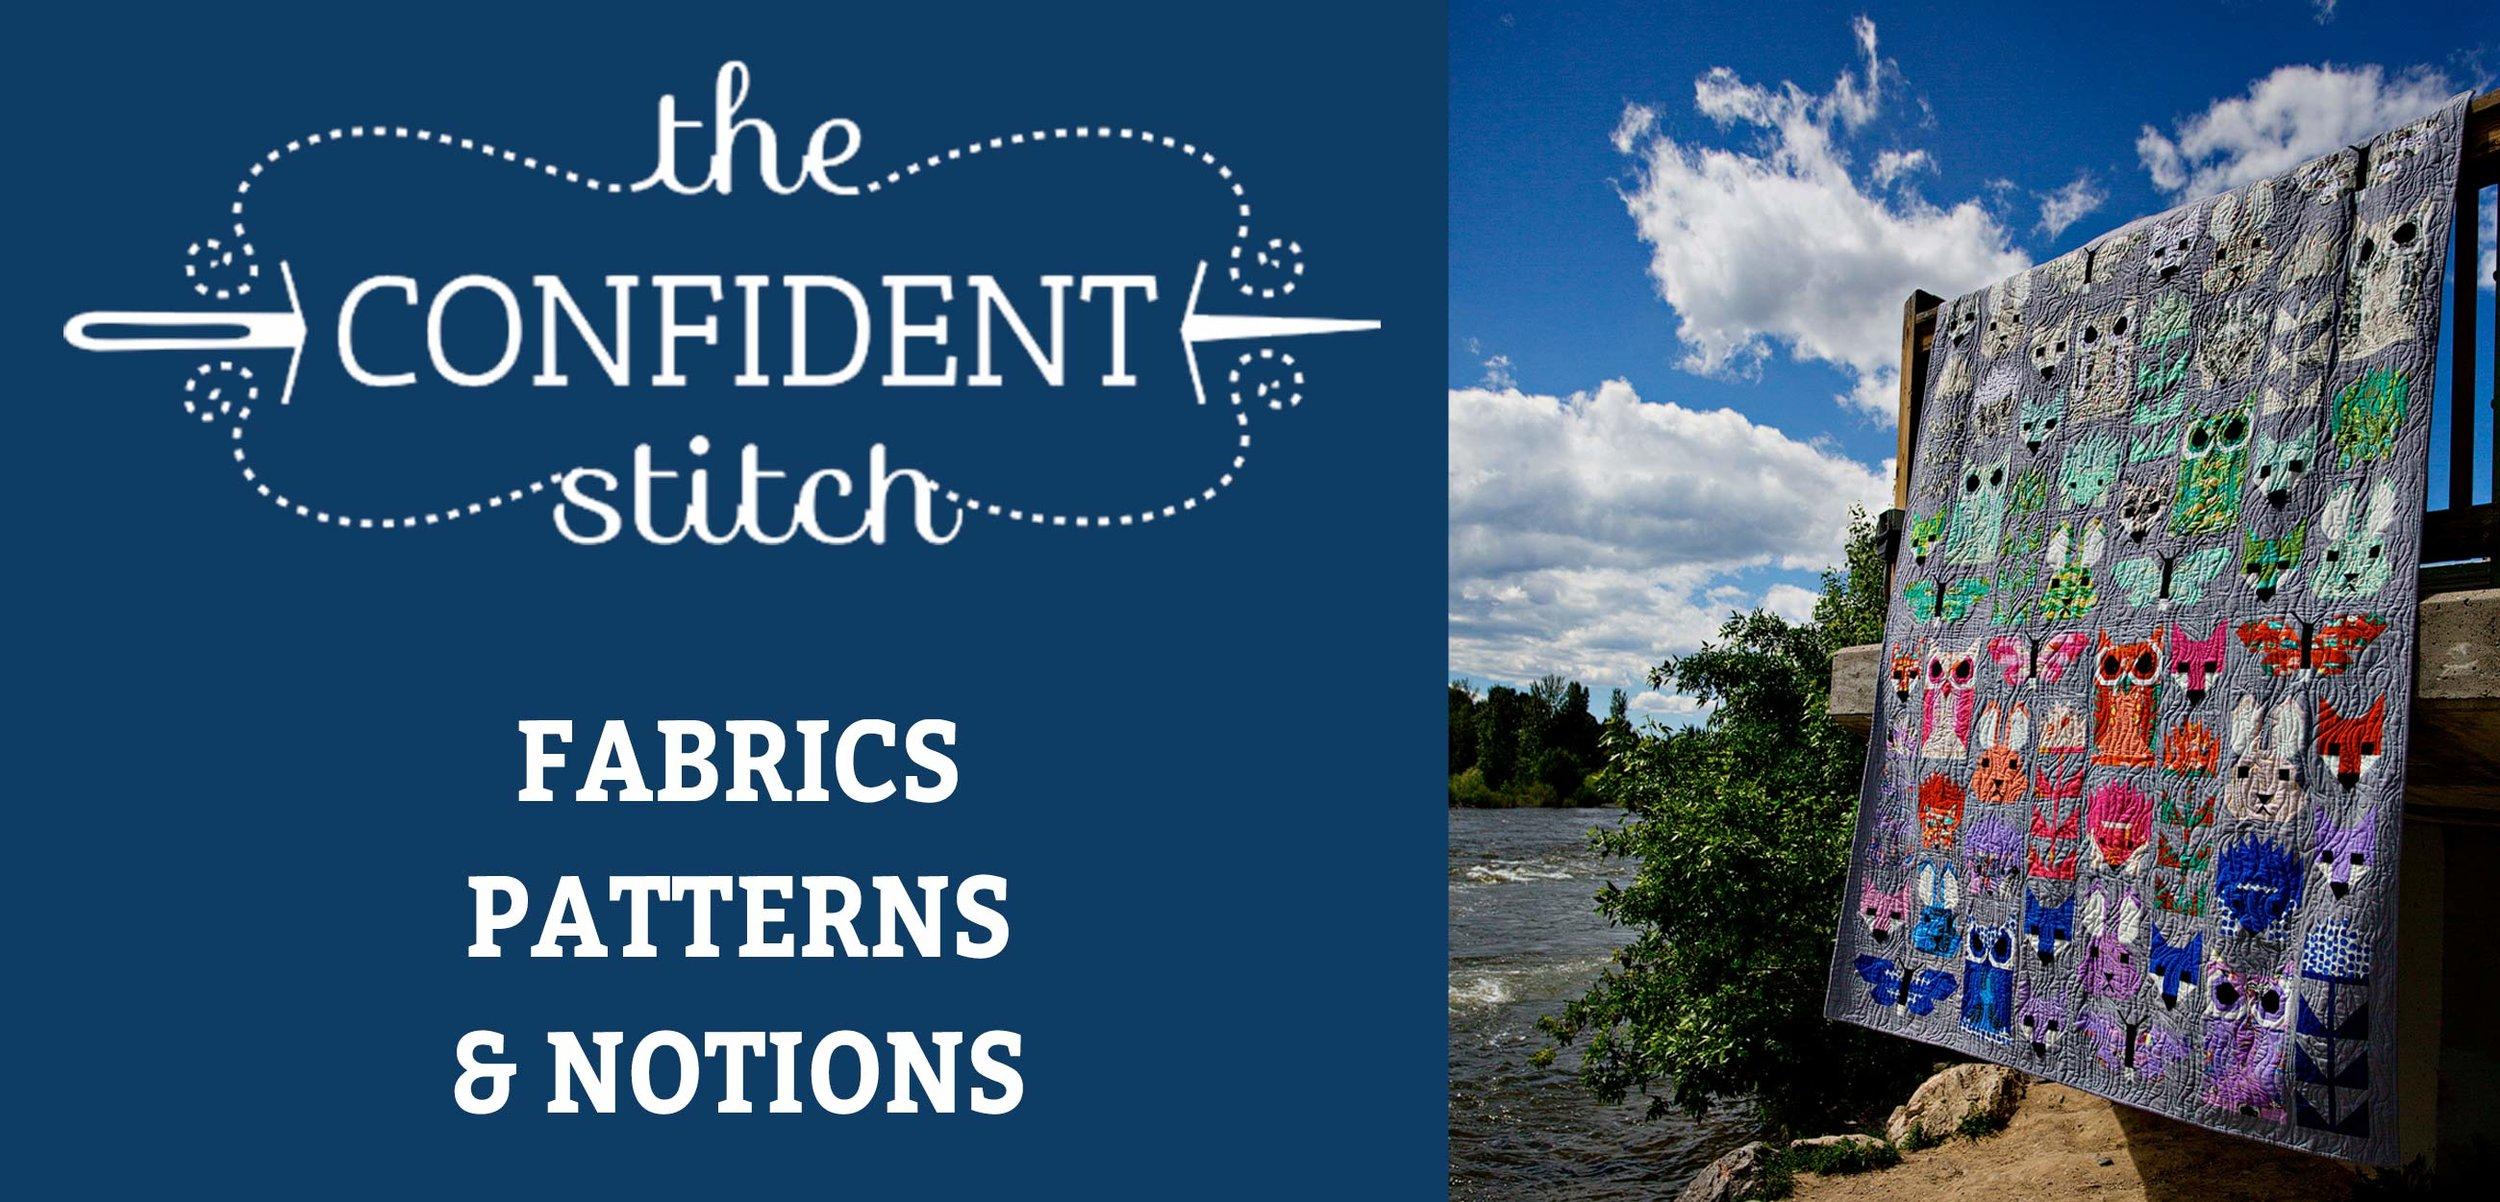 Confident-Stitch-SPRING-Ad-b.jpg